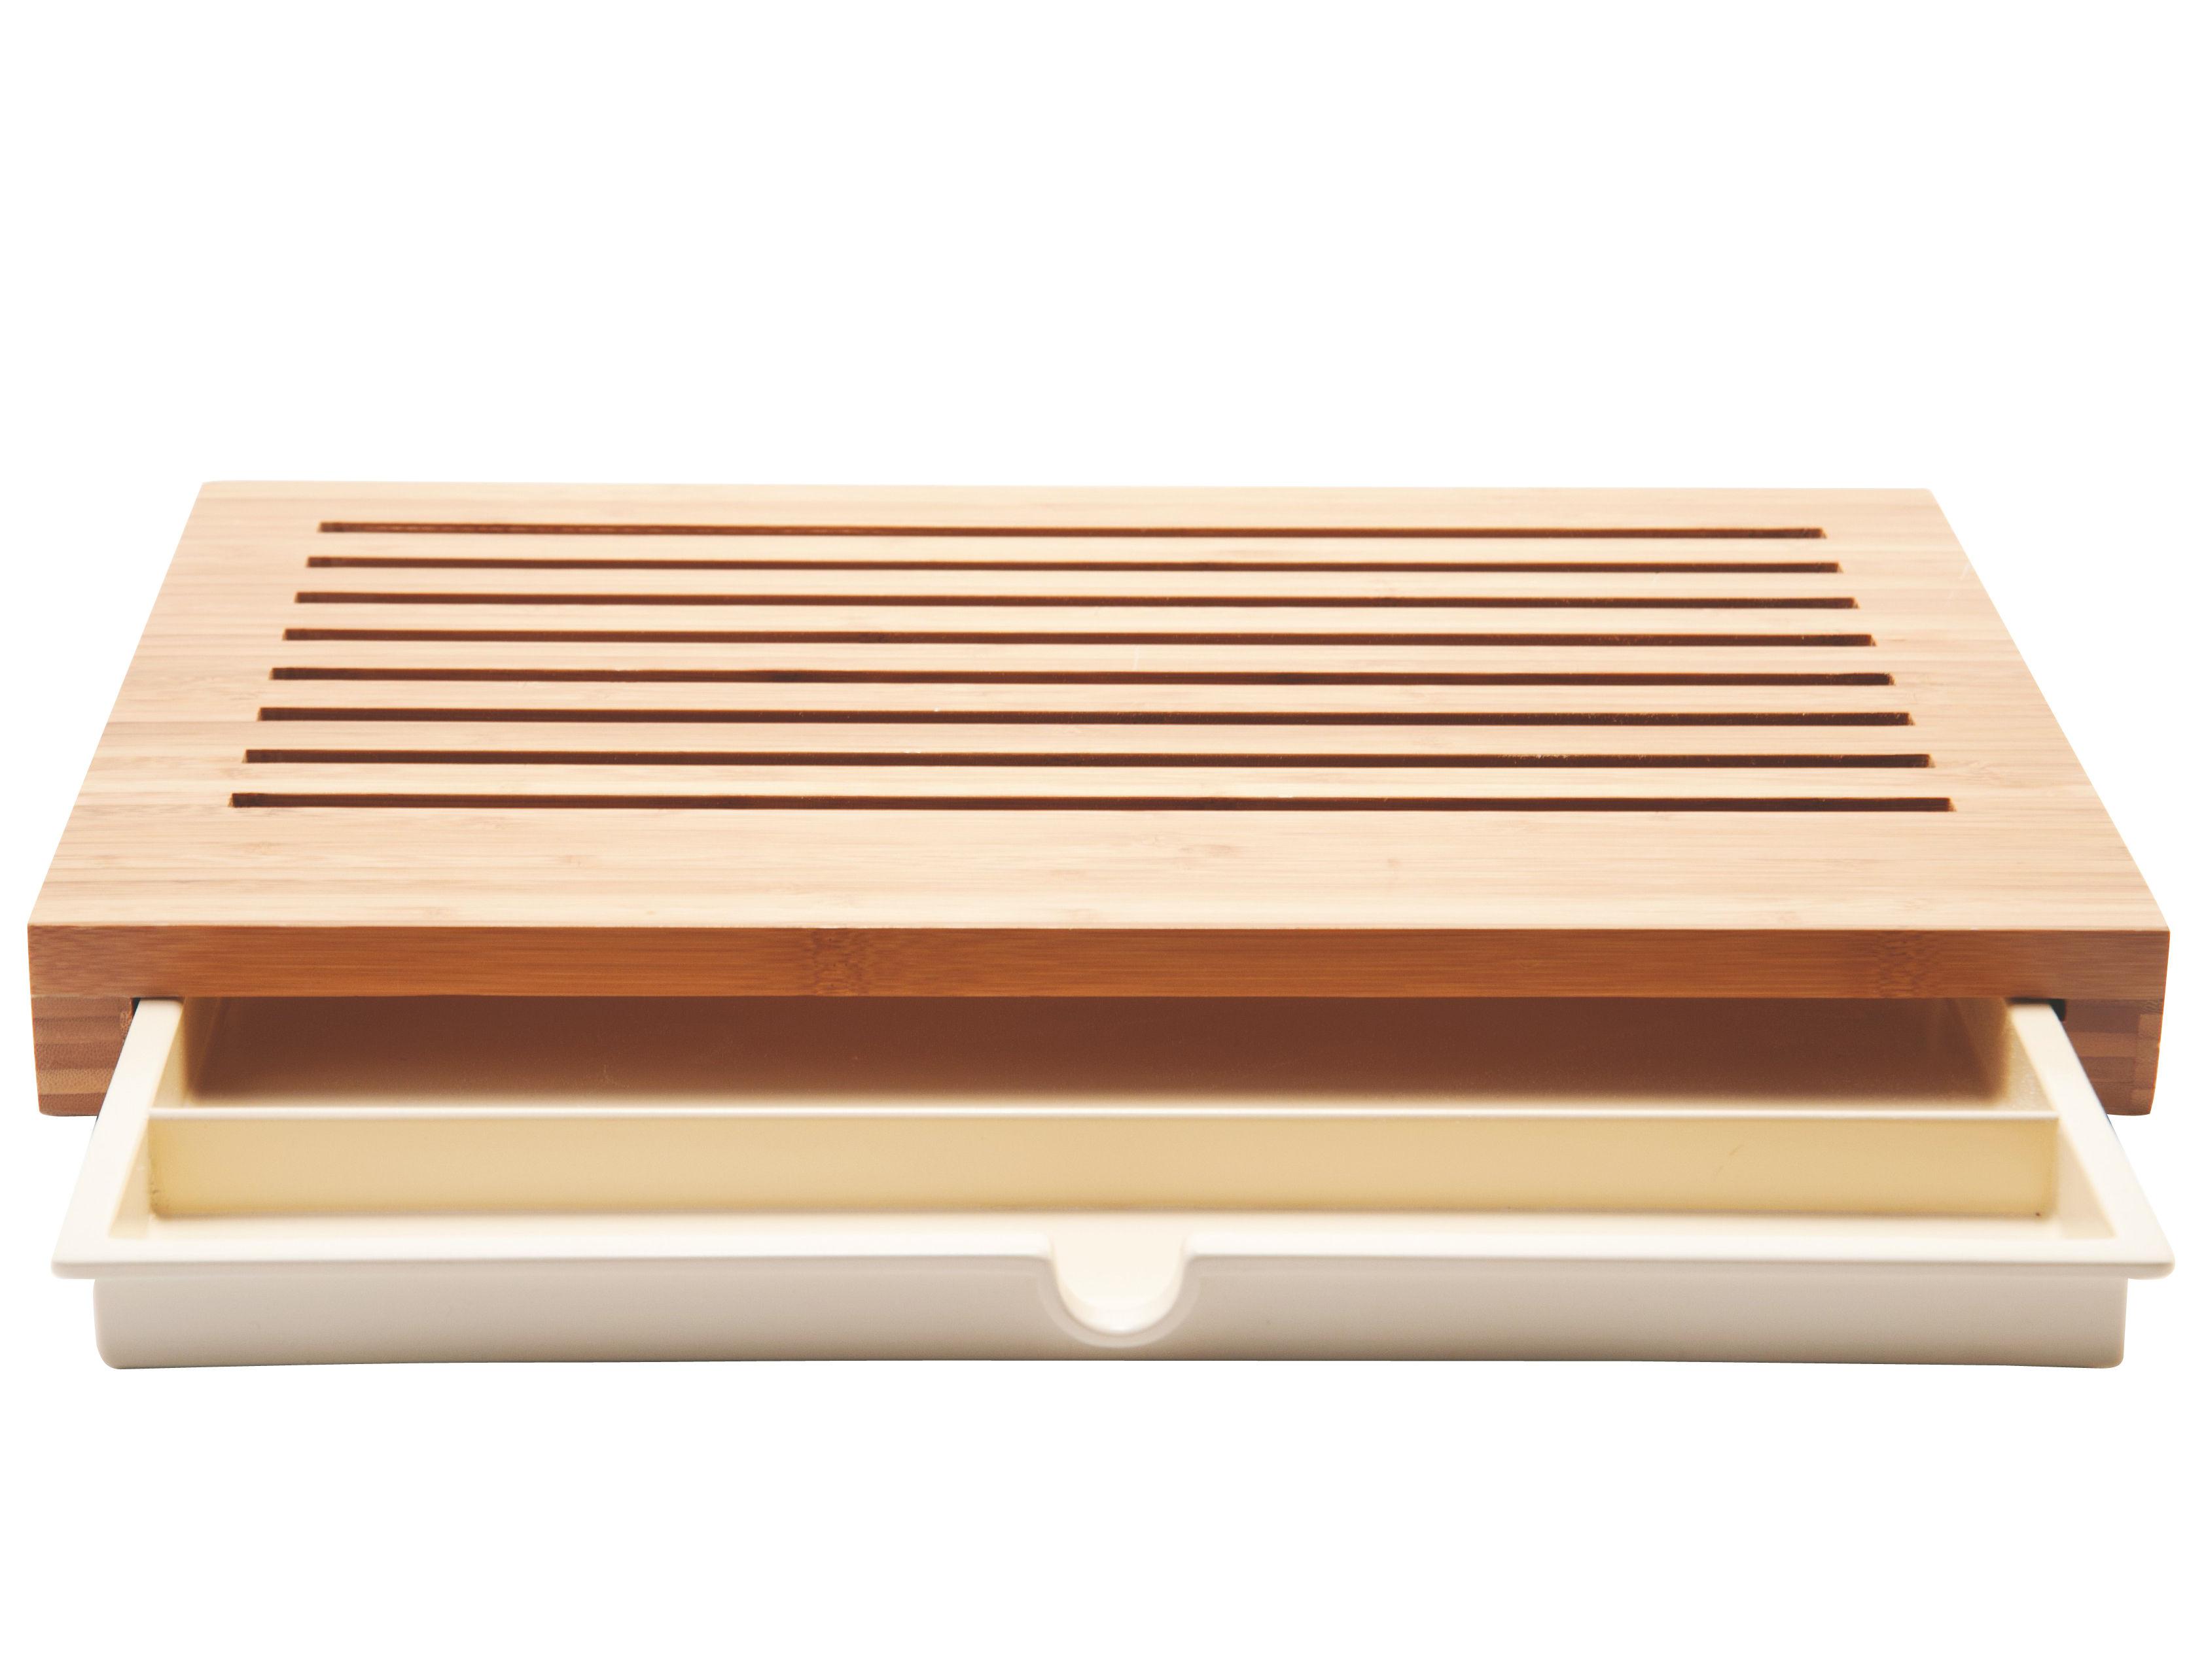 Kitchenware - Cool Kitchen Gadgets - Sbriciola - Breadboard in bamboo - Natural bamboo wood - Bamboo, Thermoplastic resin